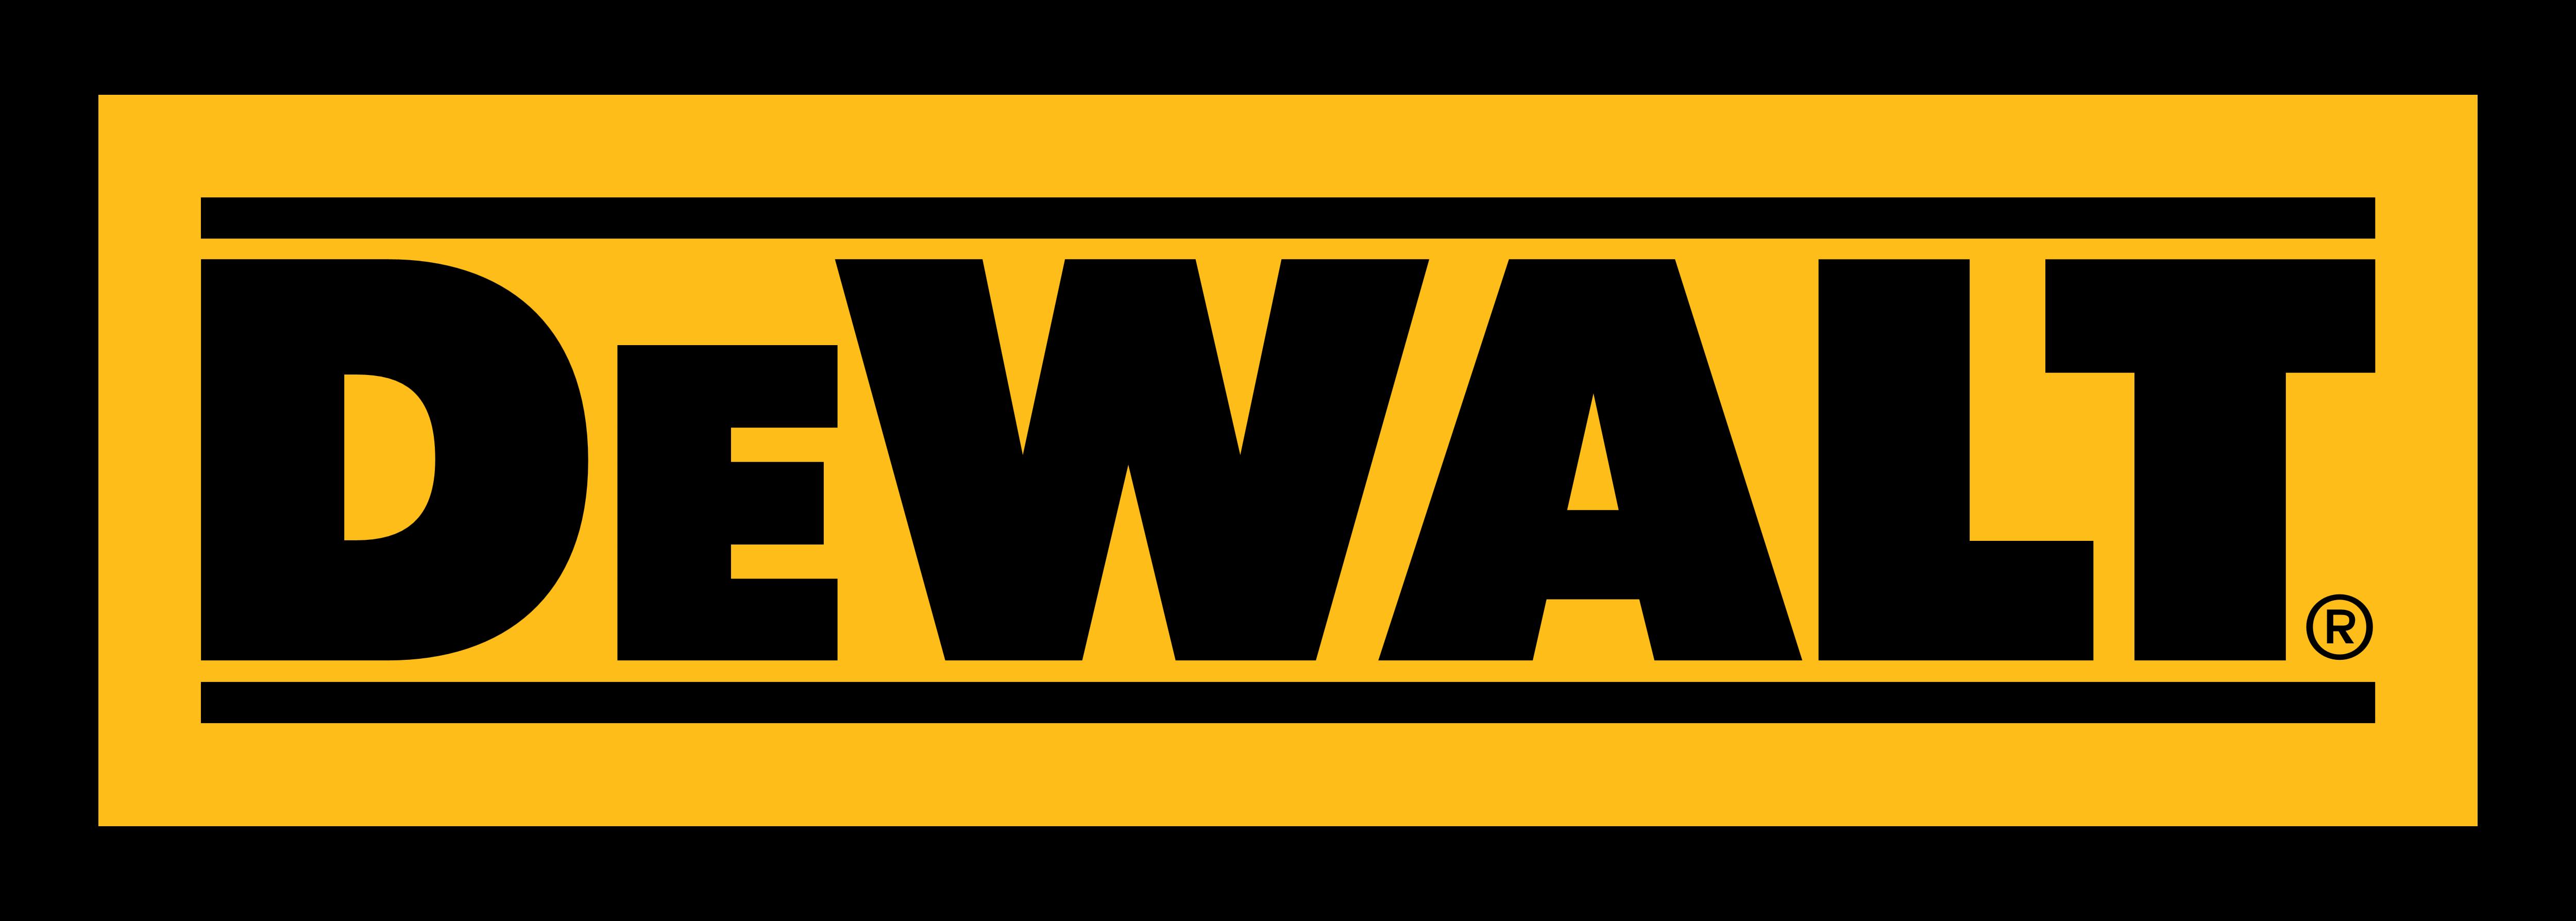 DeWALT Logo Wallpaper